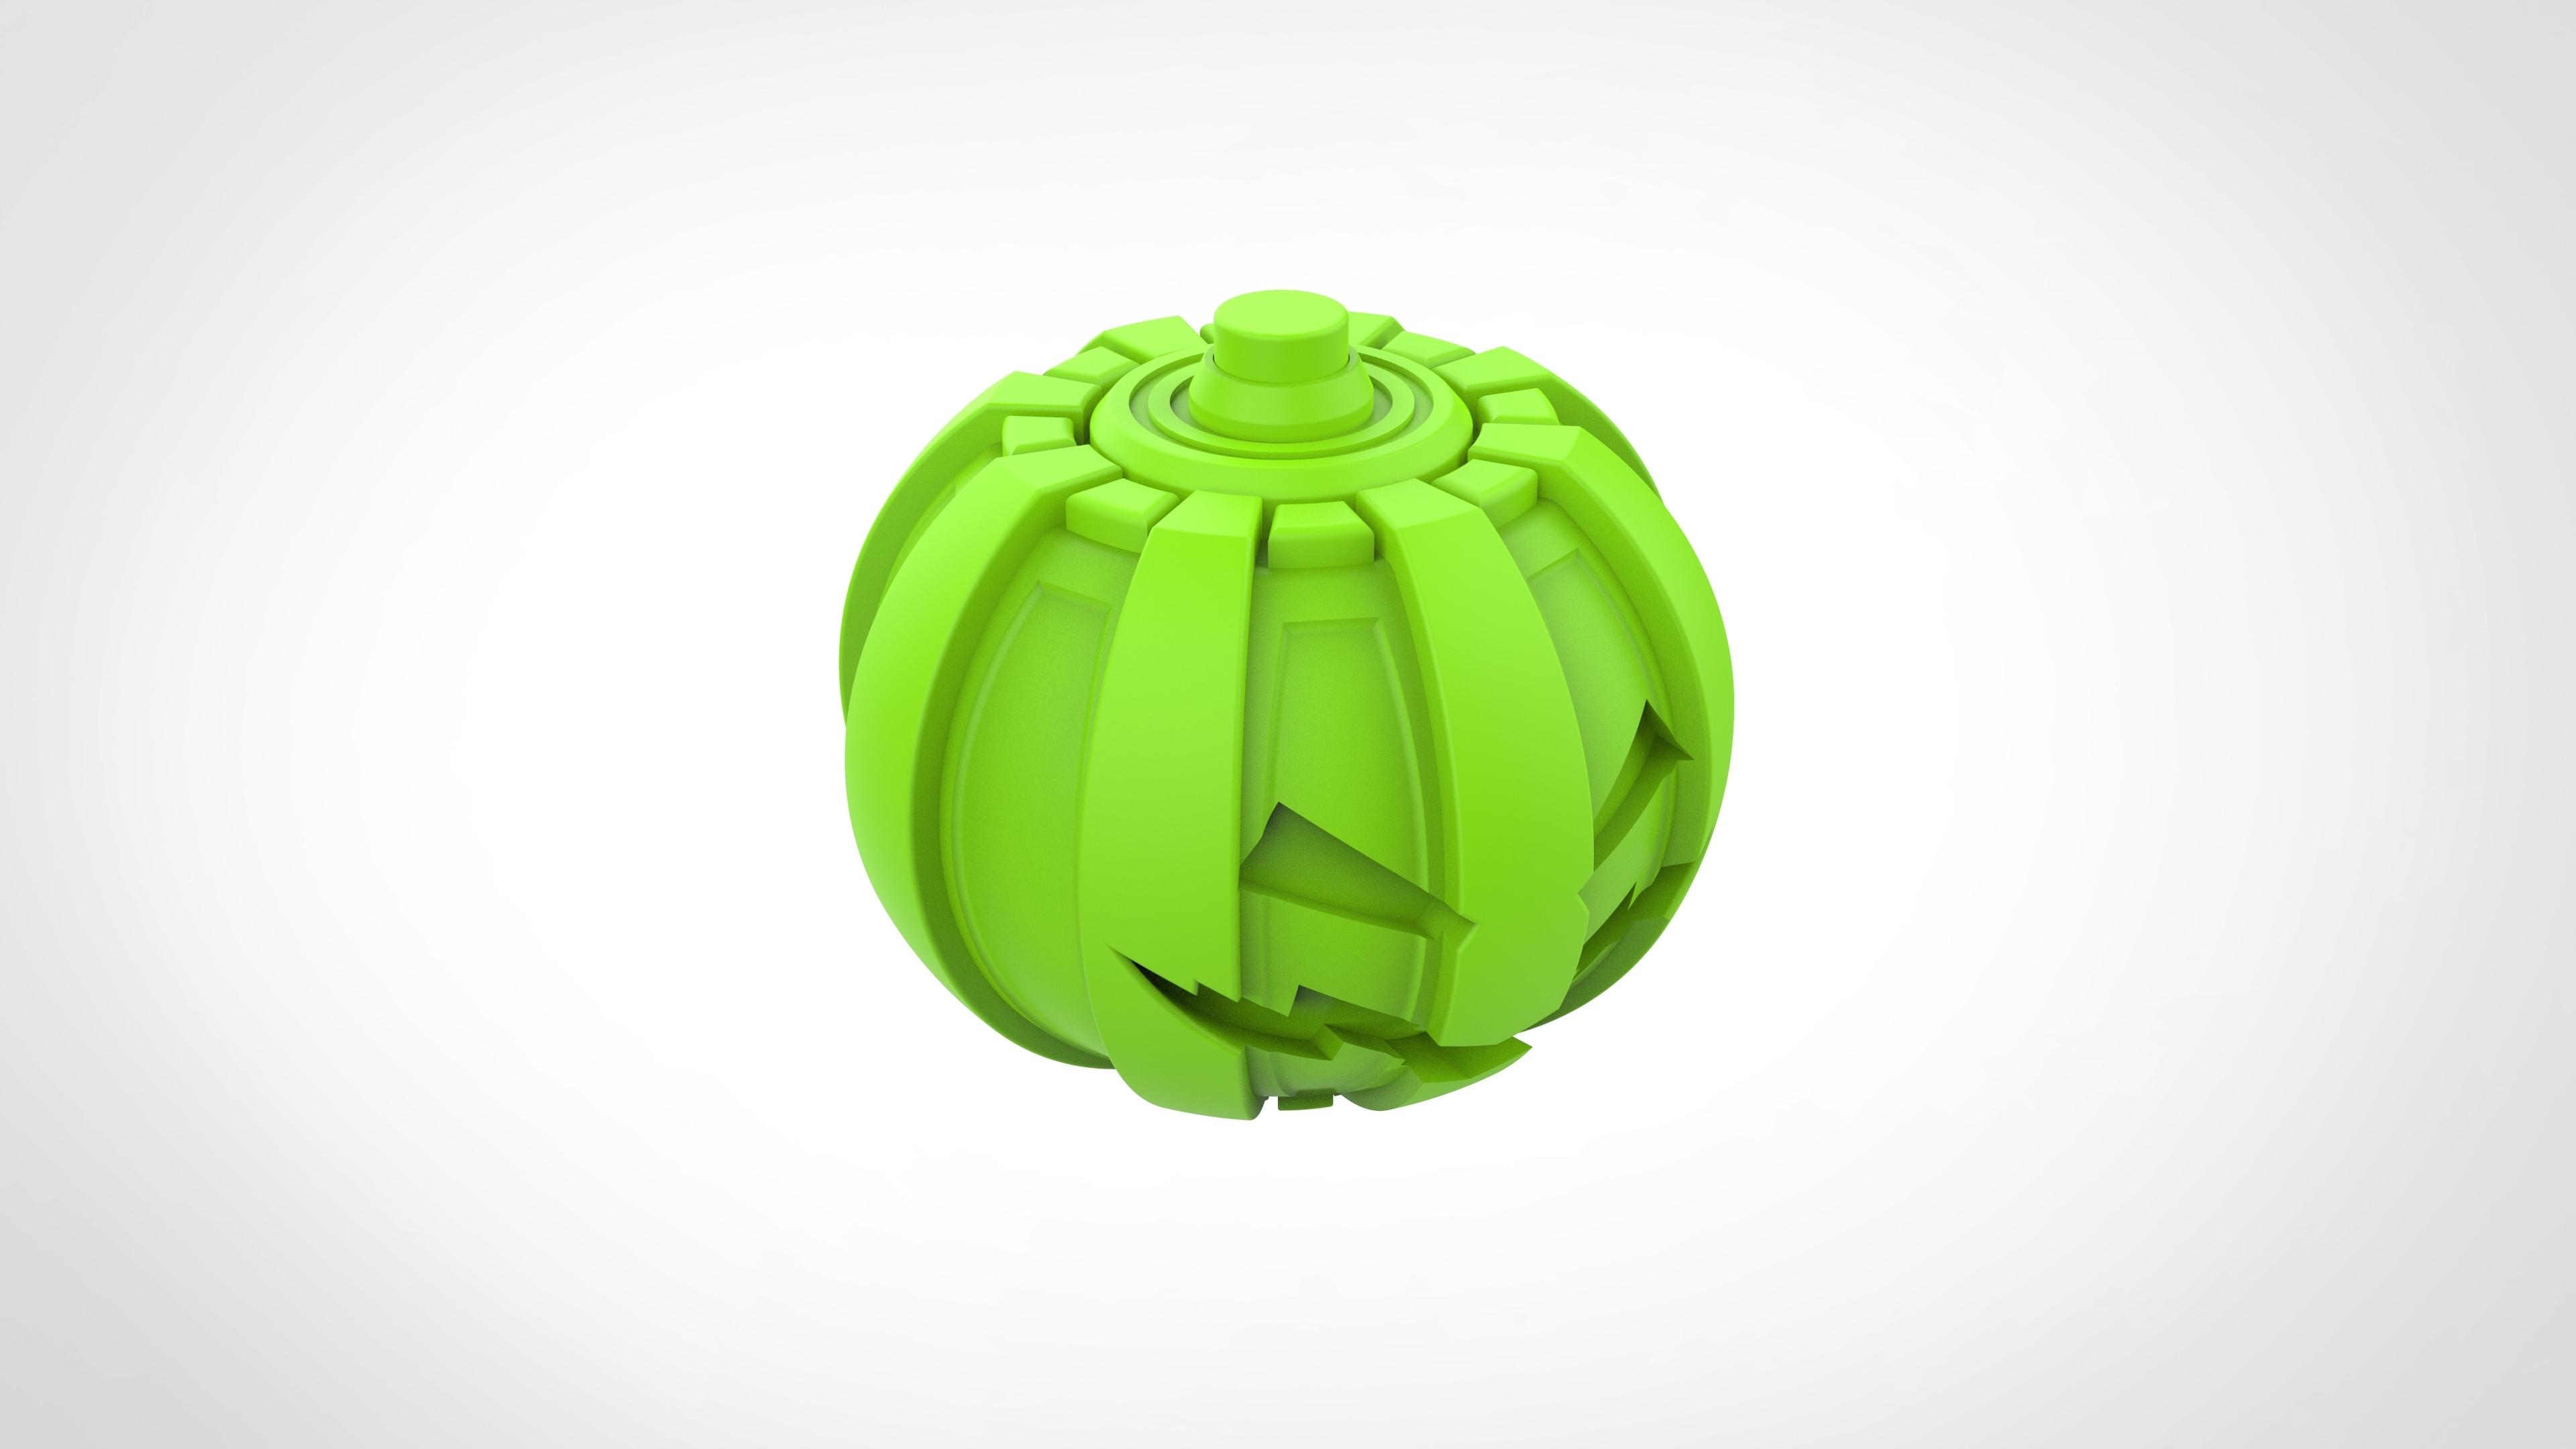 032.jpg Download 3MF file Green goblin bombs from the Spide-Man comics • 3D print model, vetrock